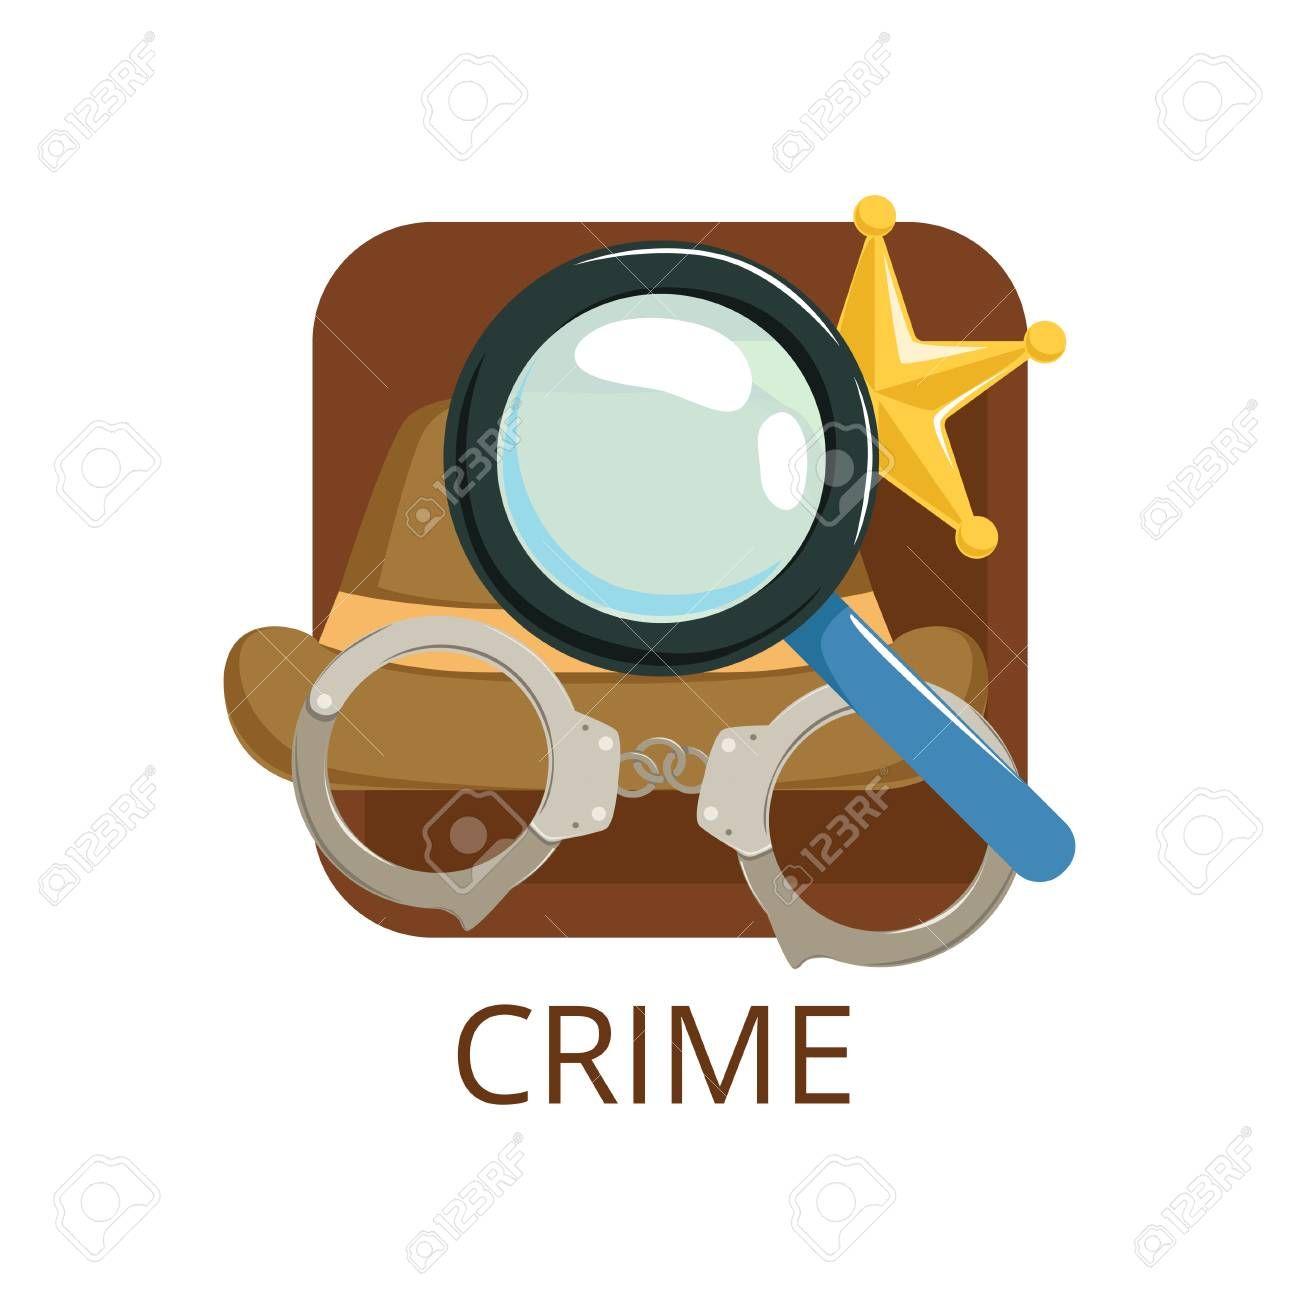 Crime cinema genre symbol for cinema theatre channel cinematography movie production vector Illustration